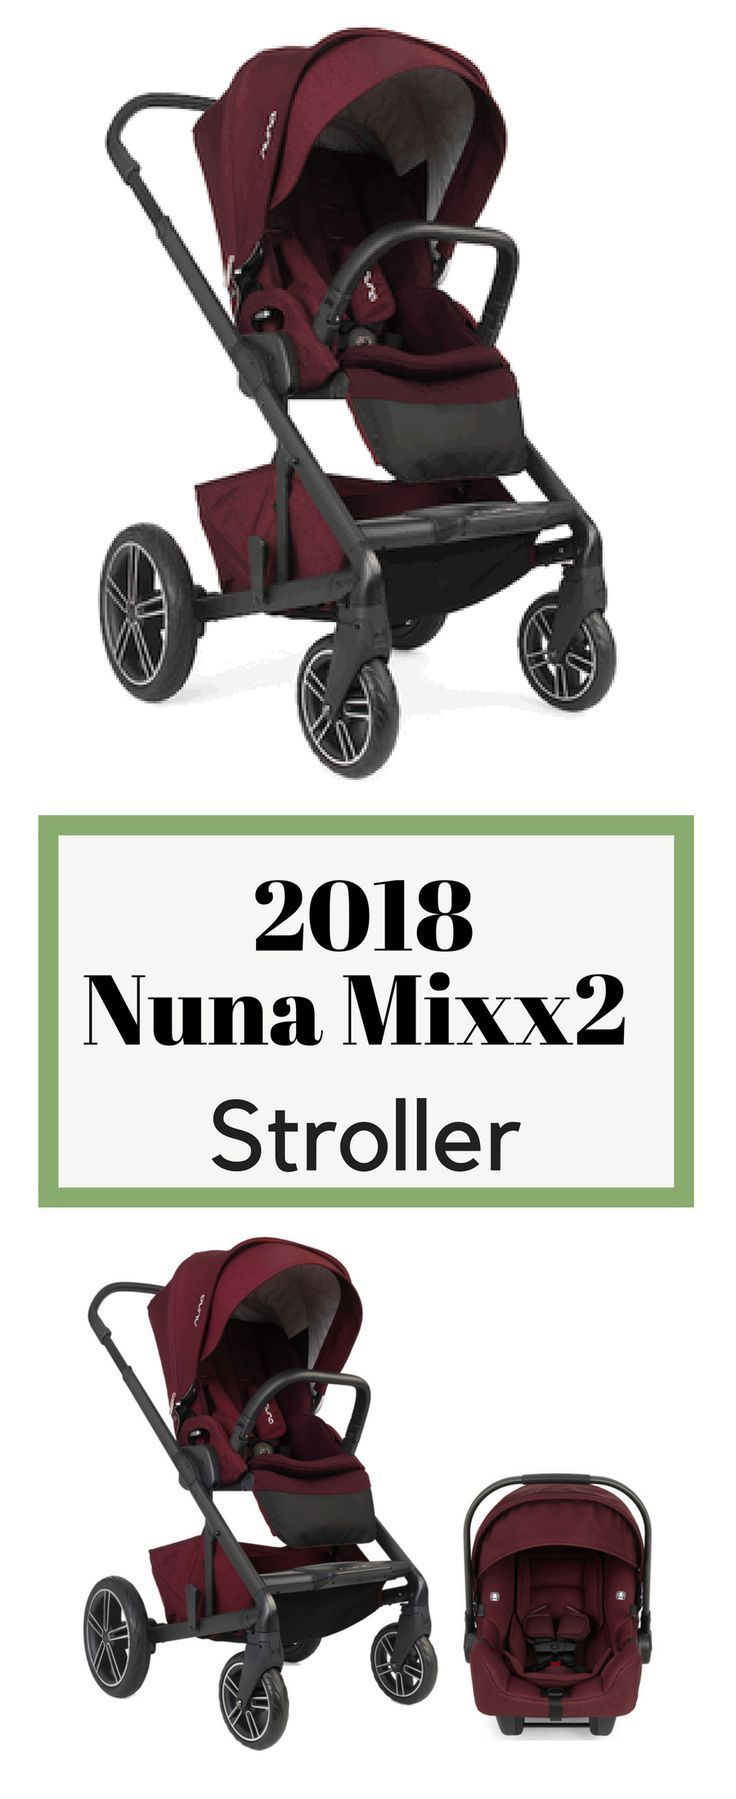 The 2018 Nuna Mixx2 Three Mode Stroller | Best baby travel ...